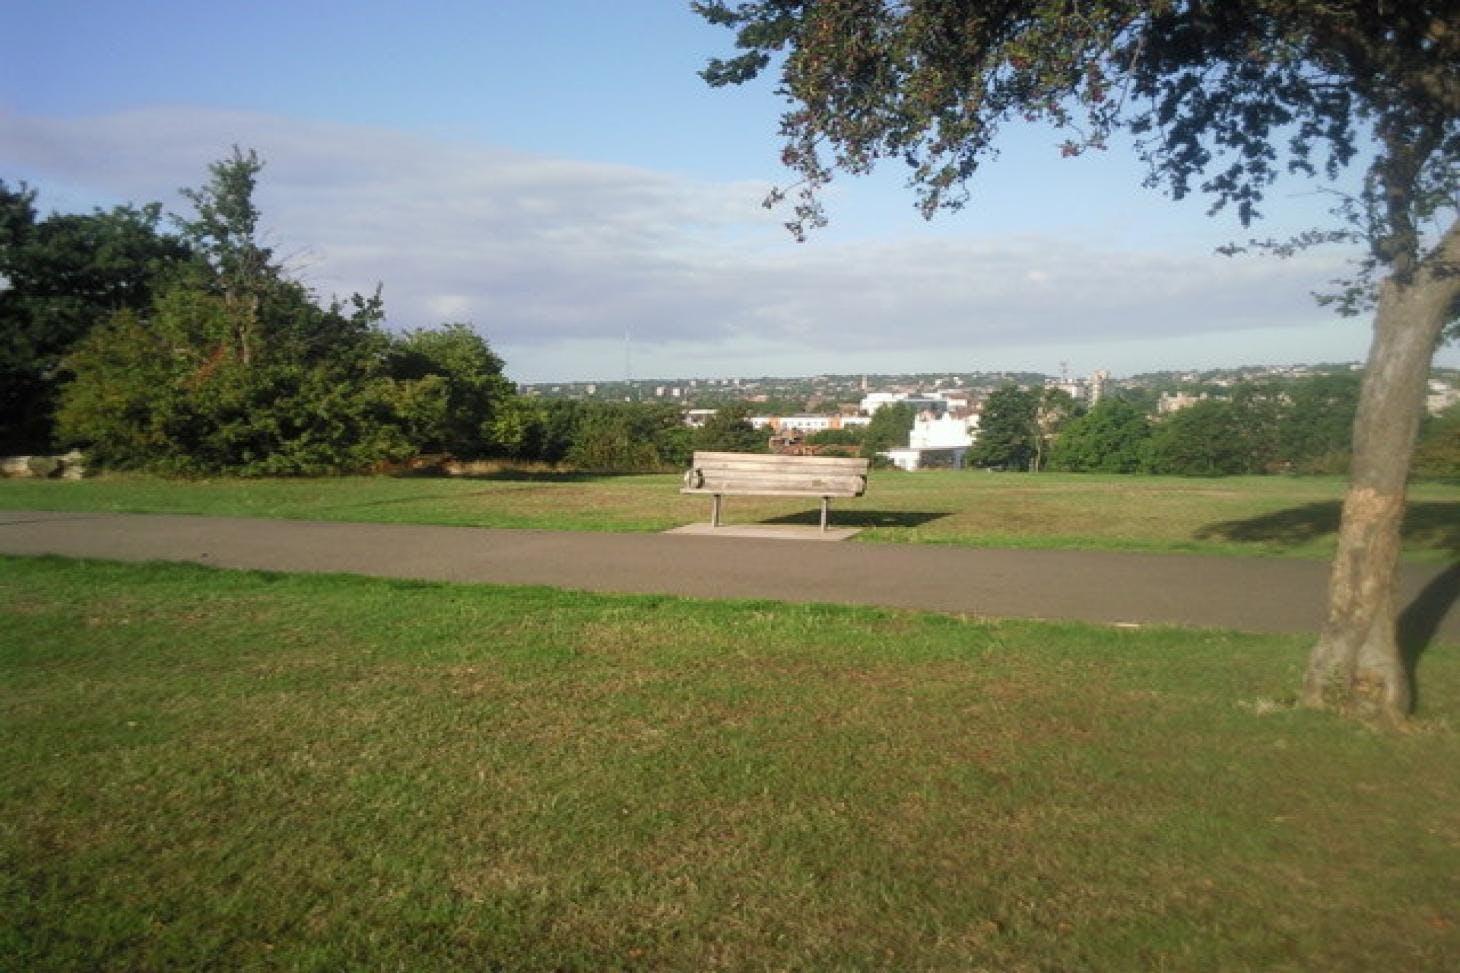 Mountsfield Park Outdoor   Hard (macadam) tennis court